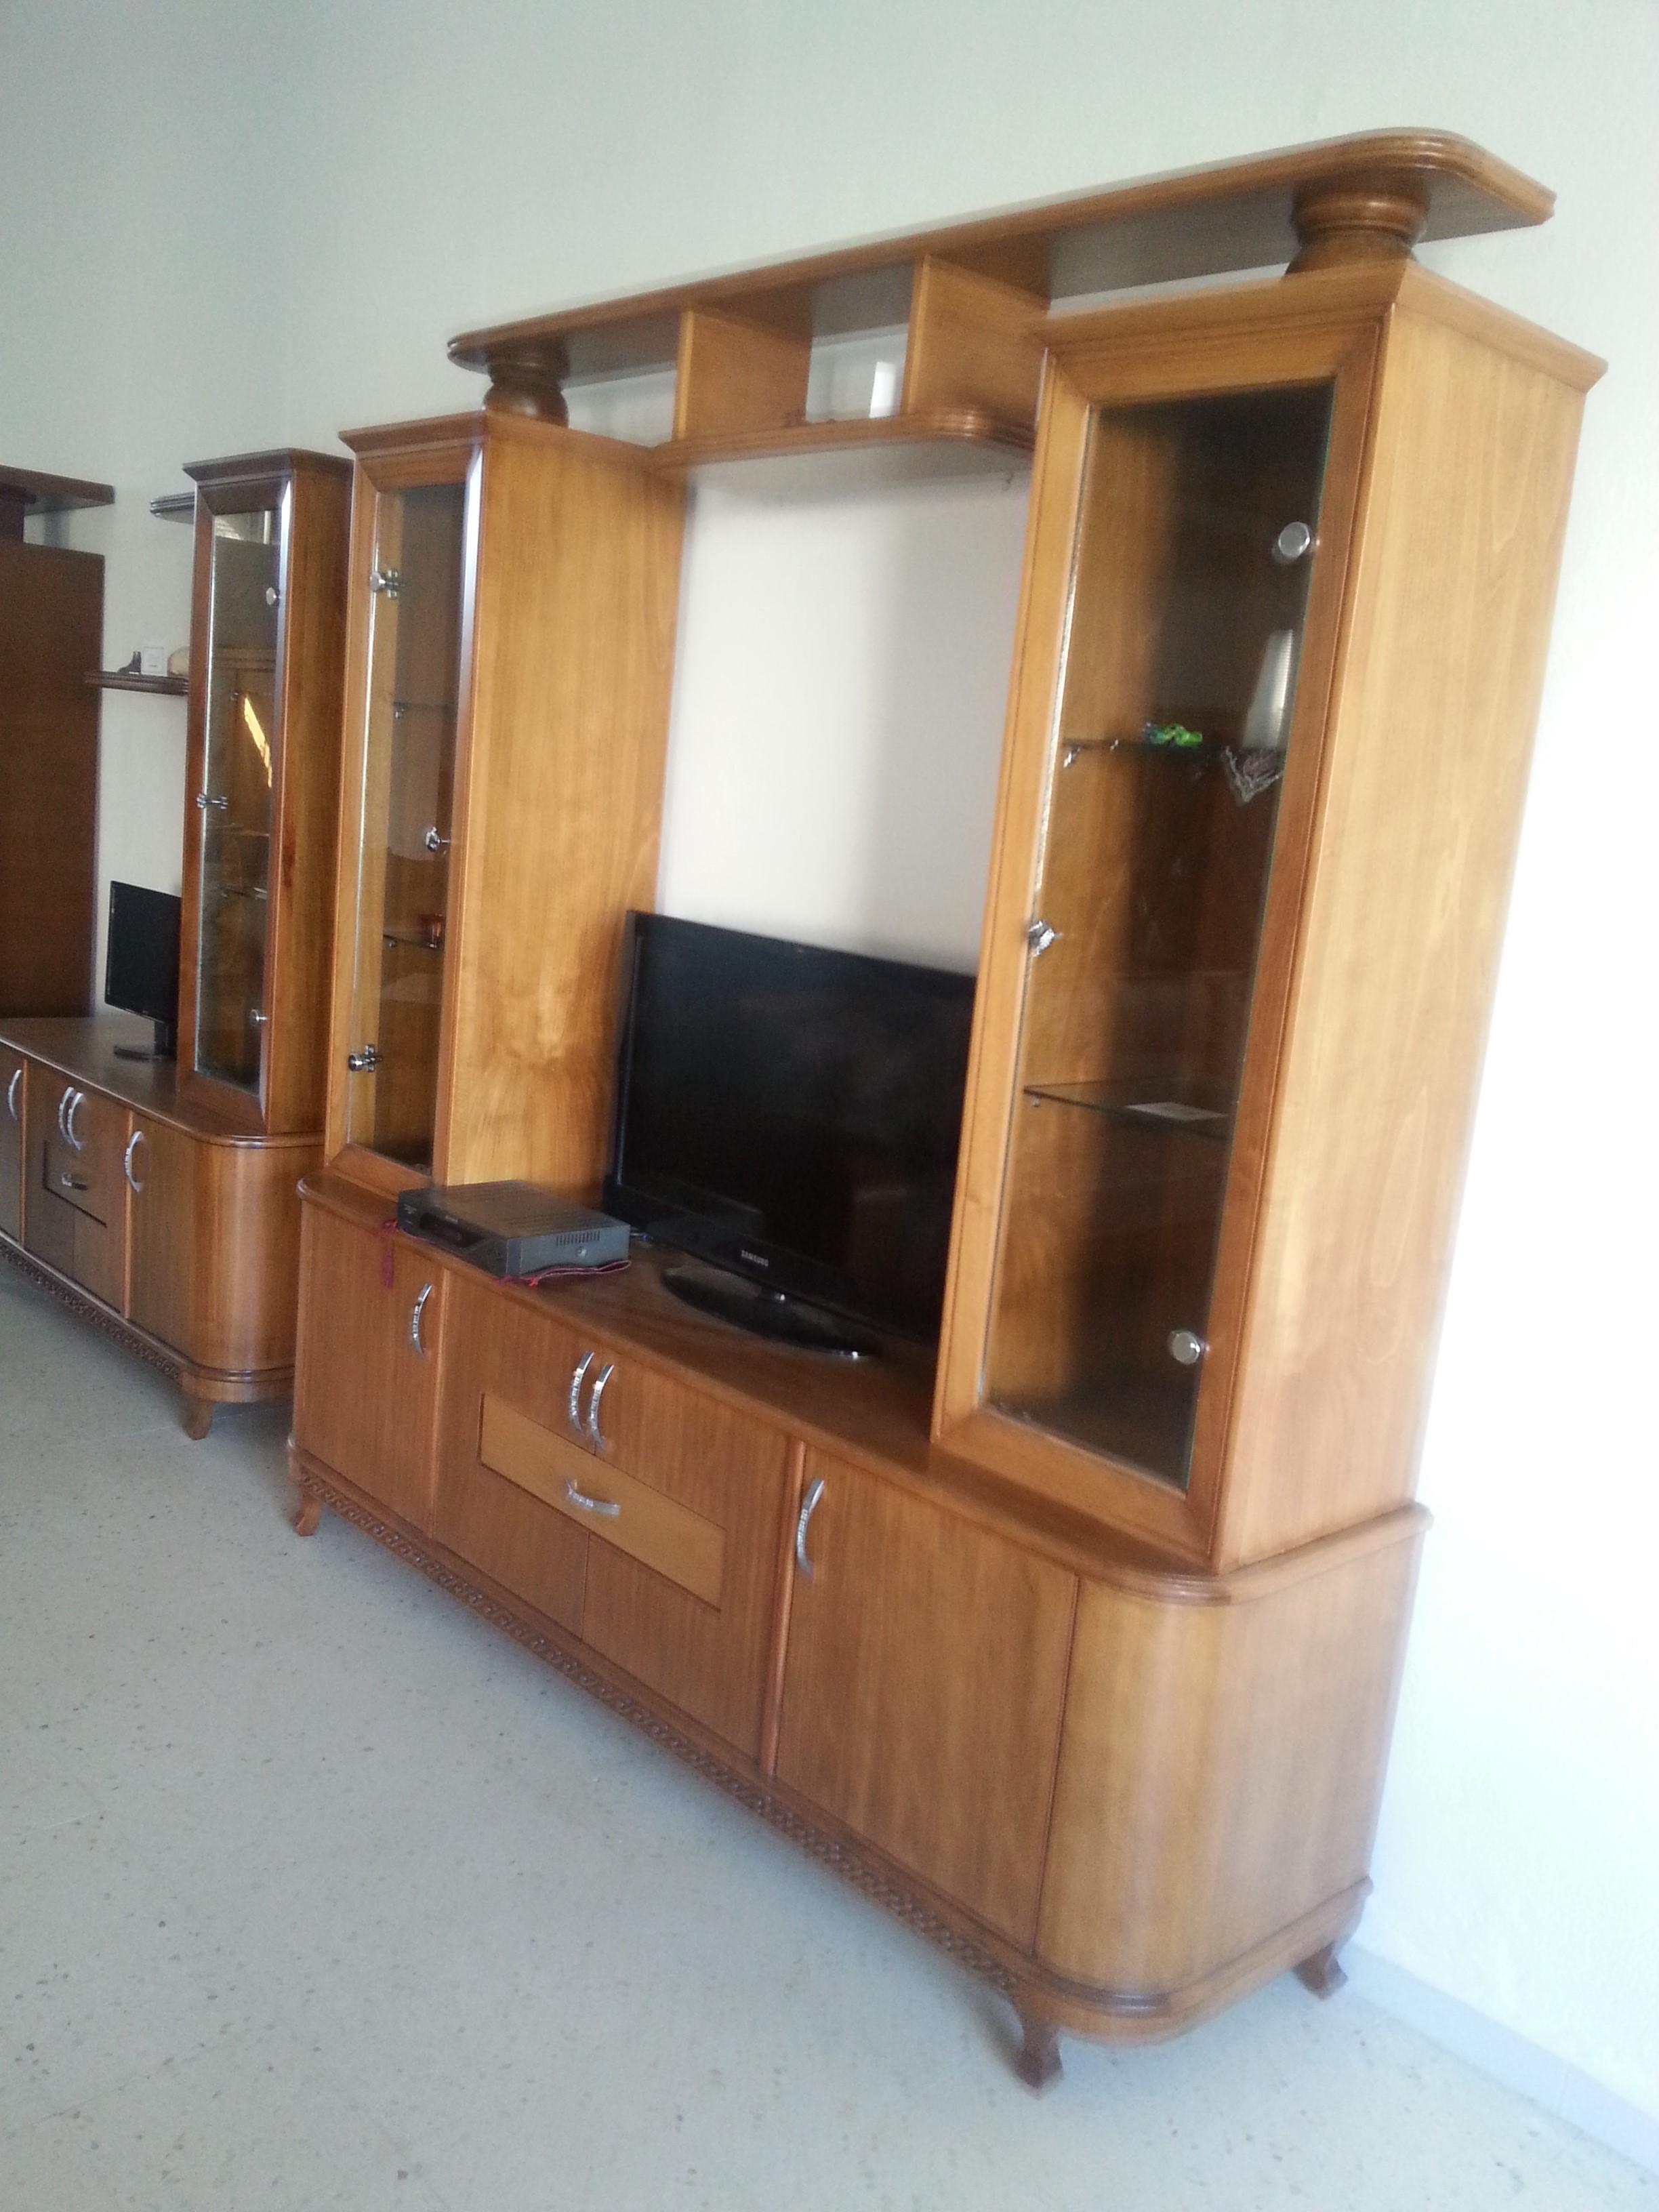 Leving barok meubles et d coration tunisie for Meuble kelibia tunisie prix